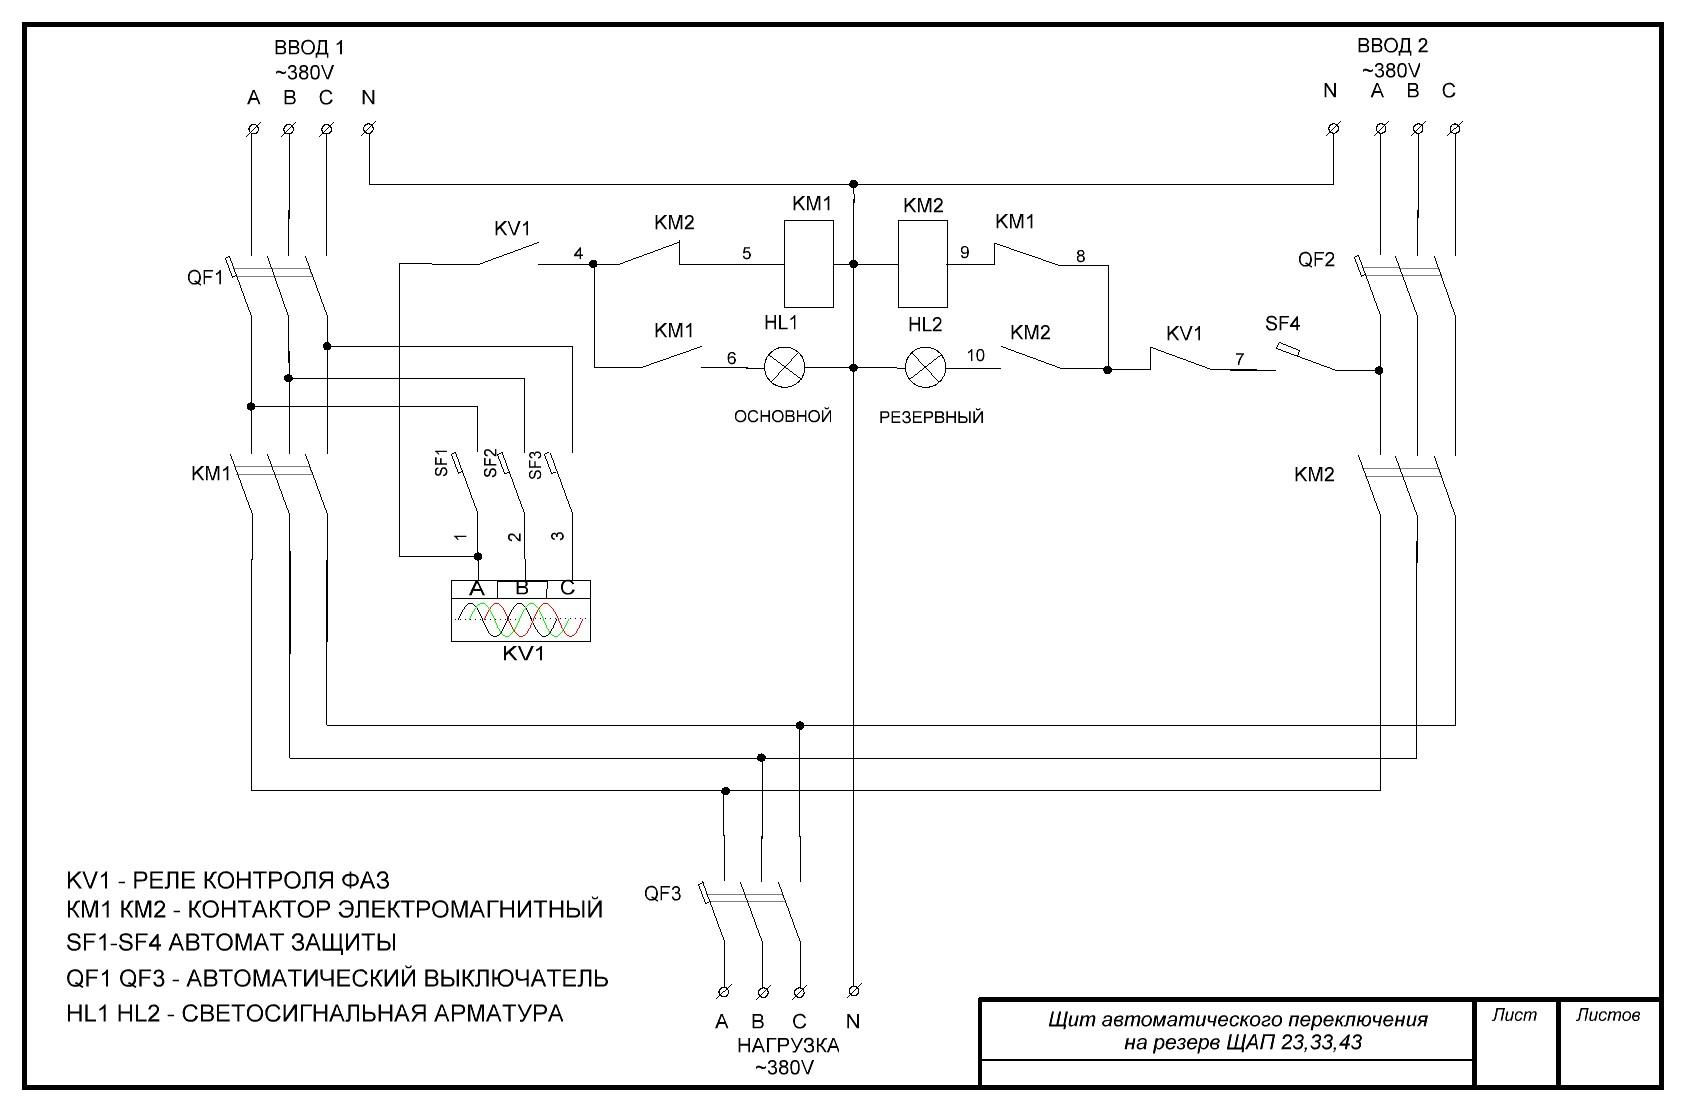 Схема щита ЩАП-23 ЩАП-33 ЩАП-43